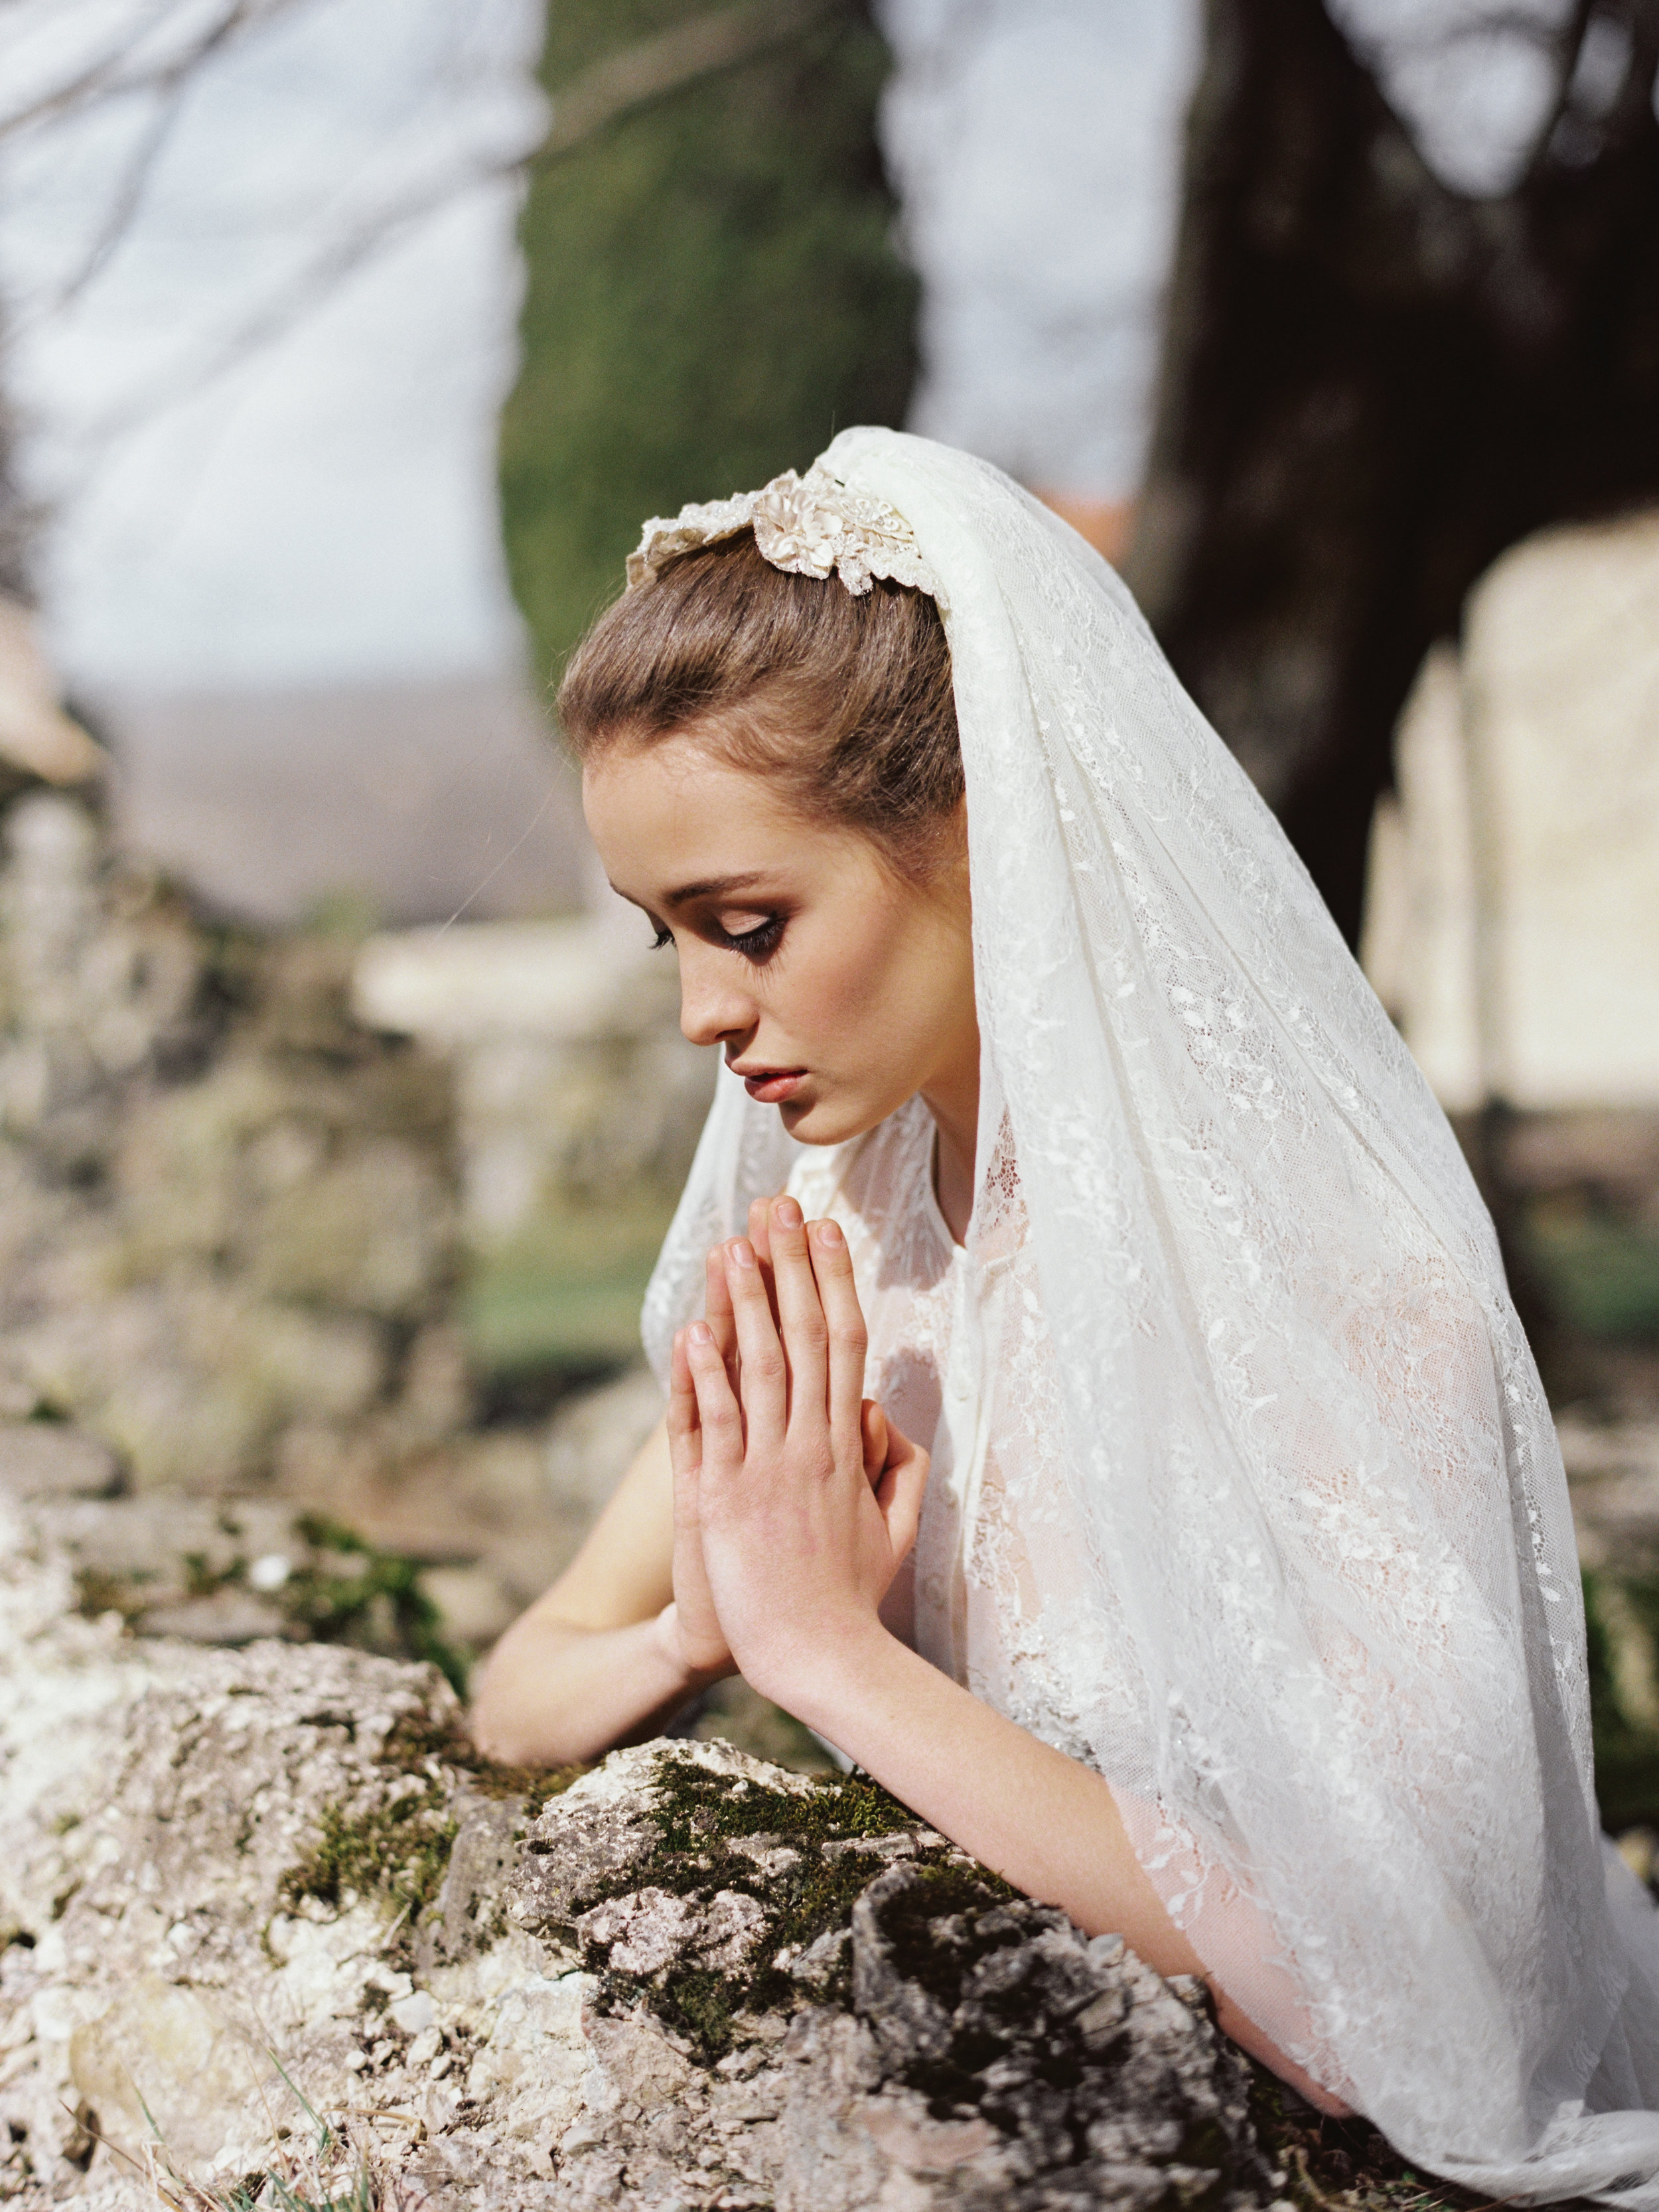 TamaraGigolaphotography,Cathytelle,royalweddingdress,kakheti-0028-5.JPG